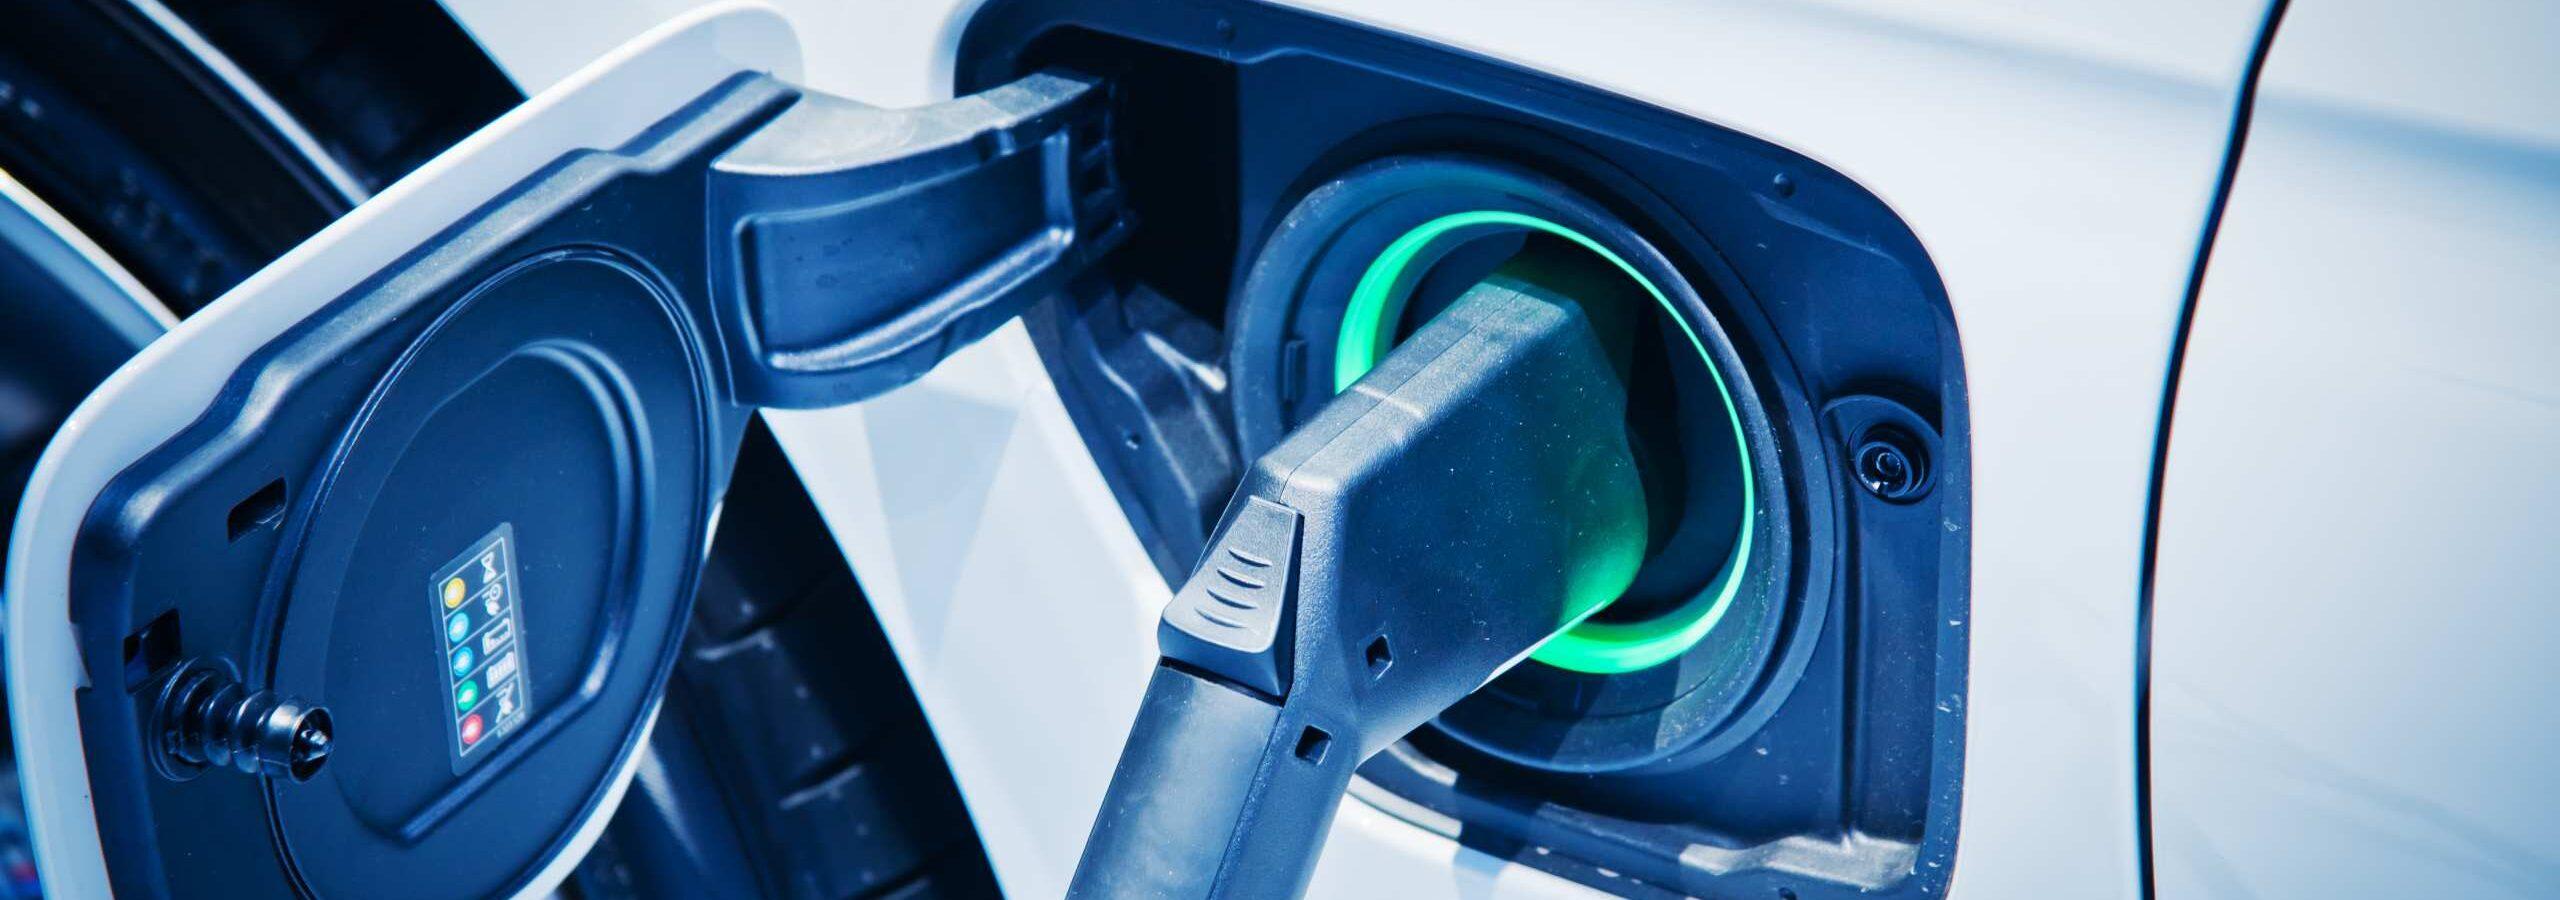 H&T Batteries | H&T Rechargeable